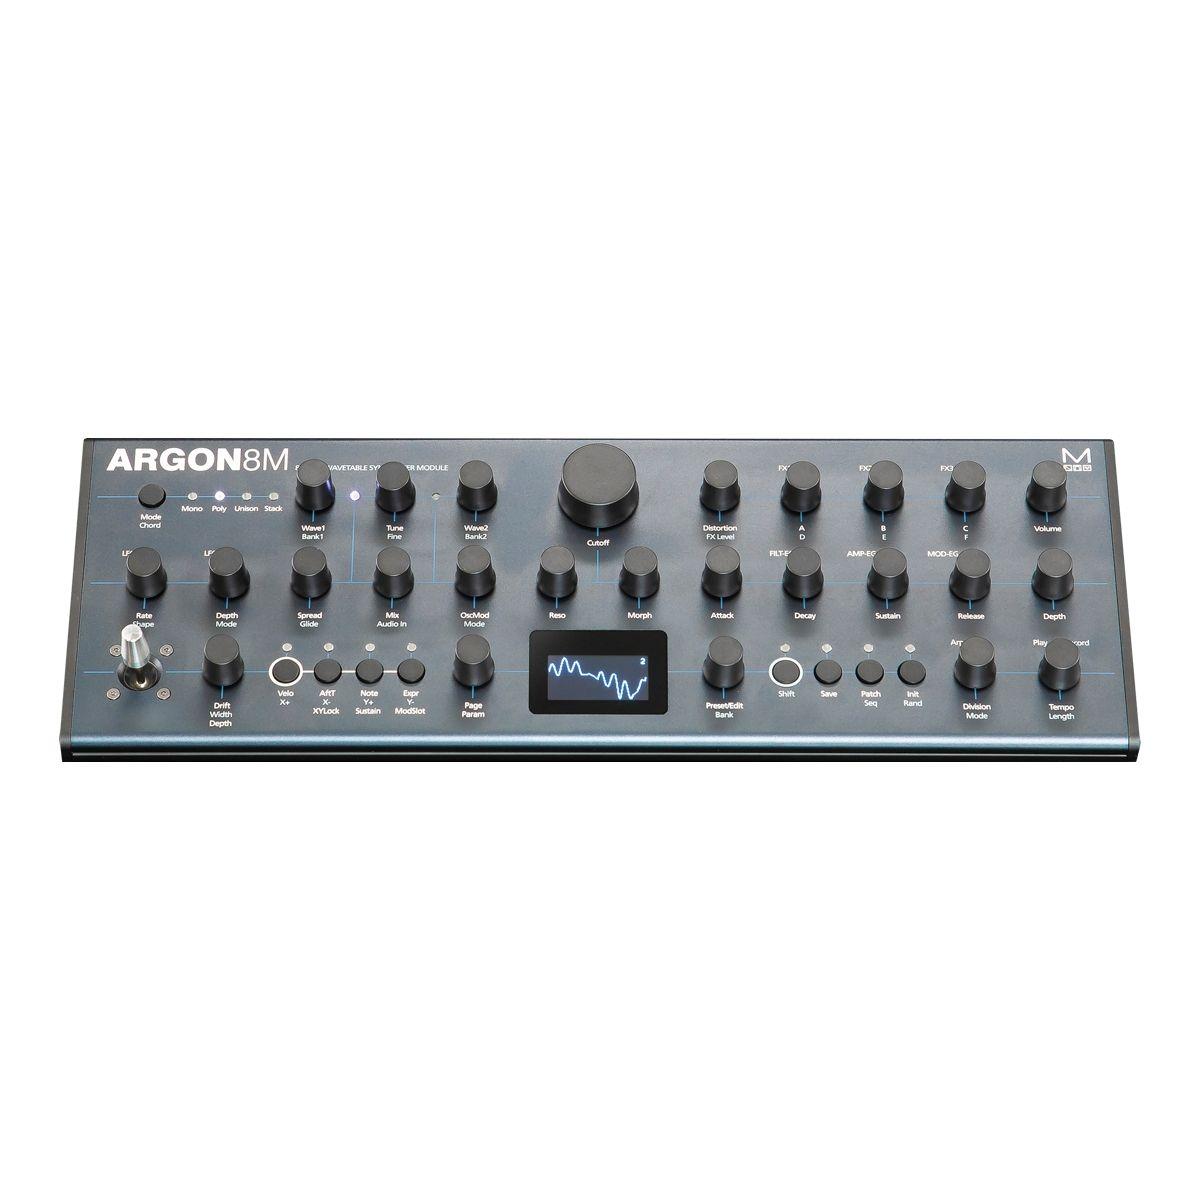 Modal Argon 8M Polyphonic Wavetable Desktop Synth